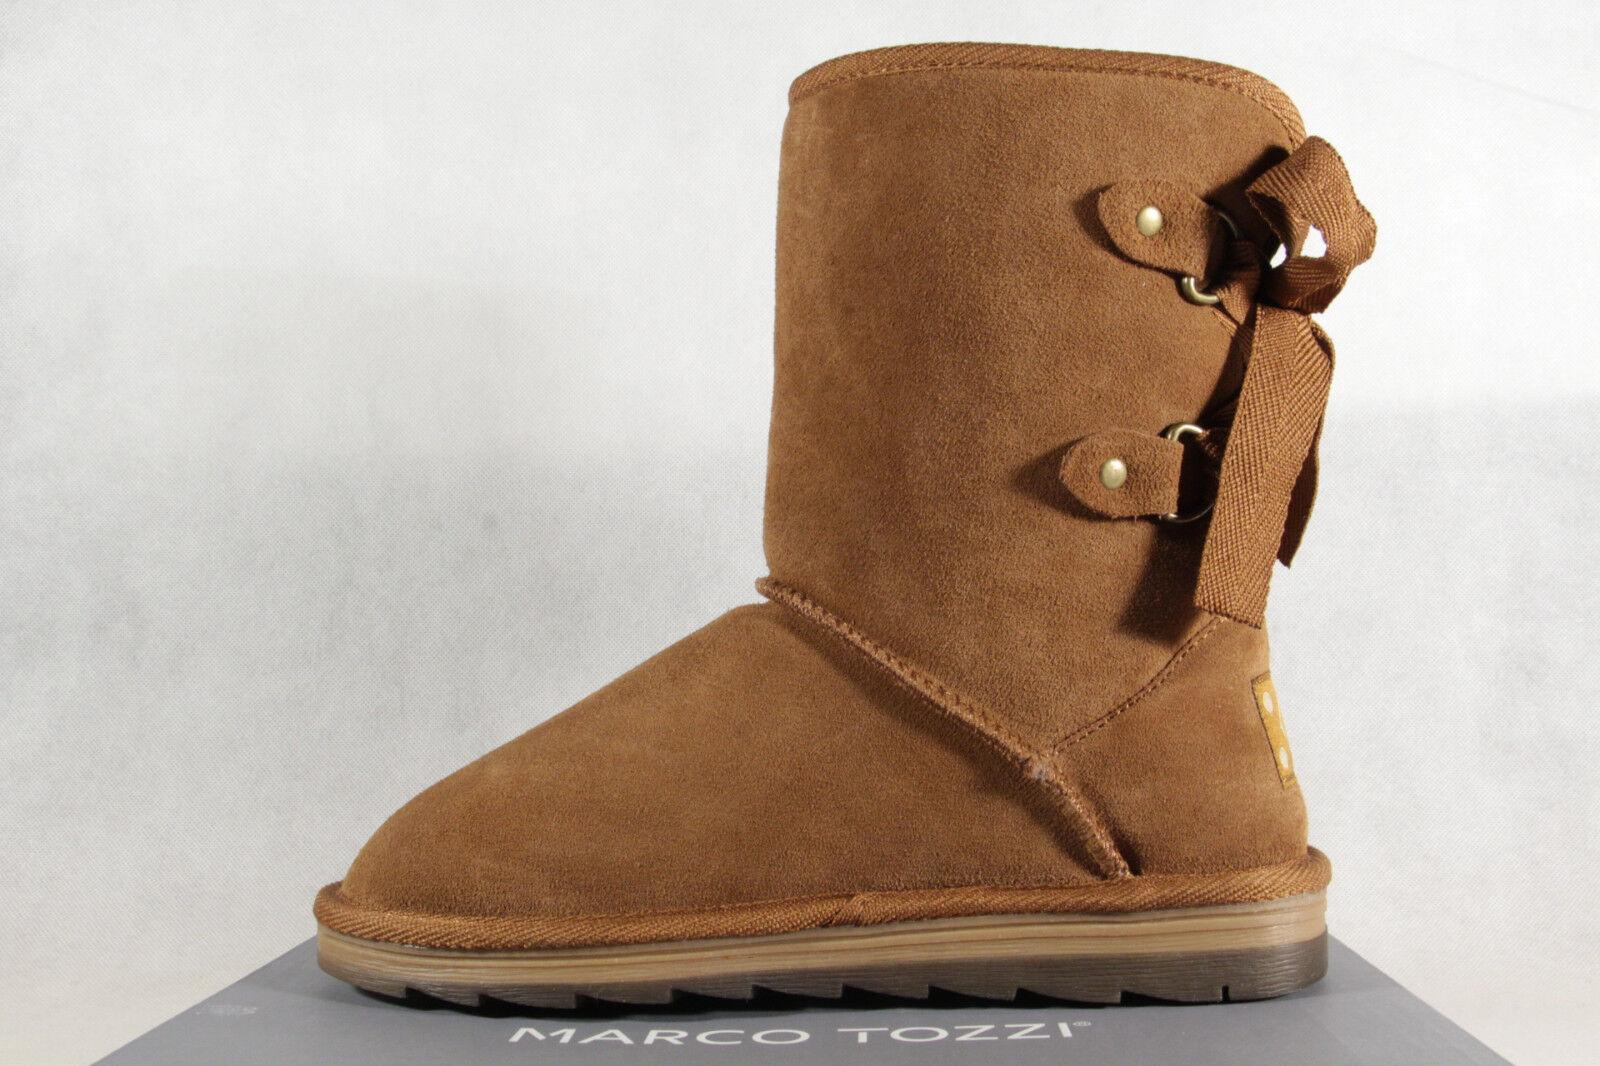 Marco Tozzi Stiefel Stiefelette Boots Winterstiefel braun 26823 NEU!!